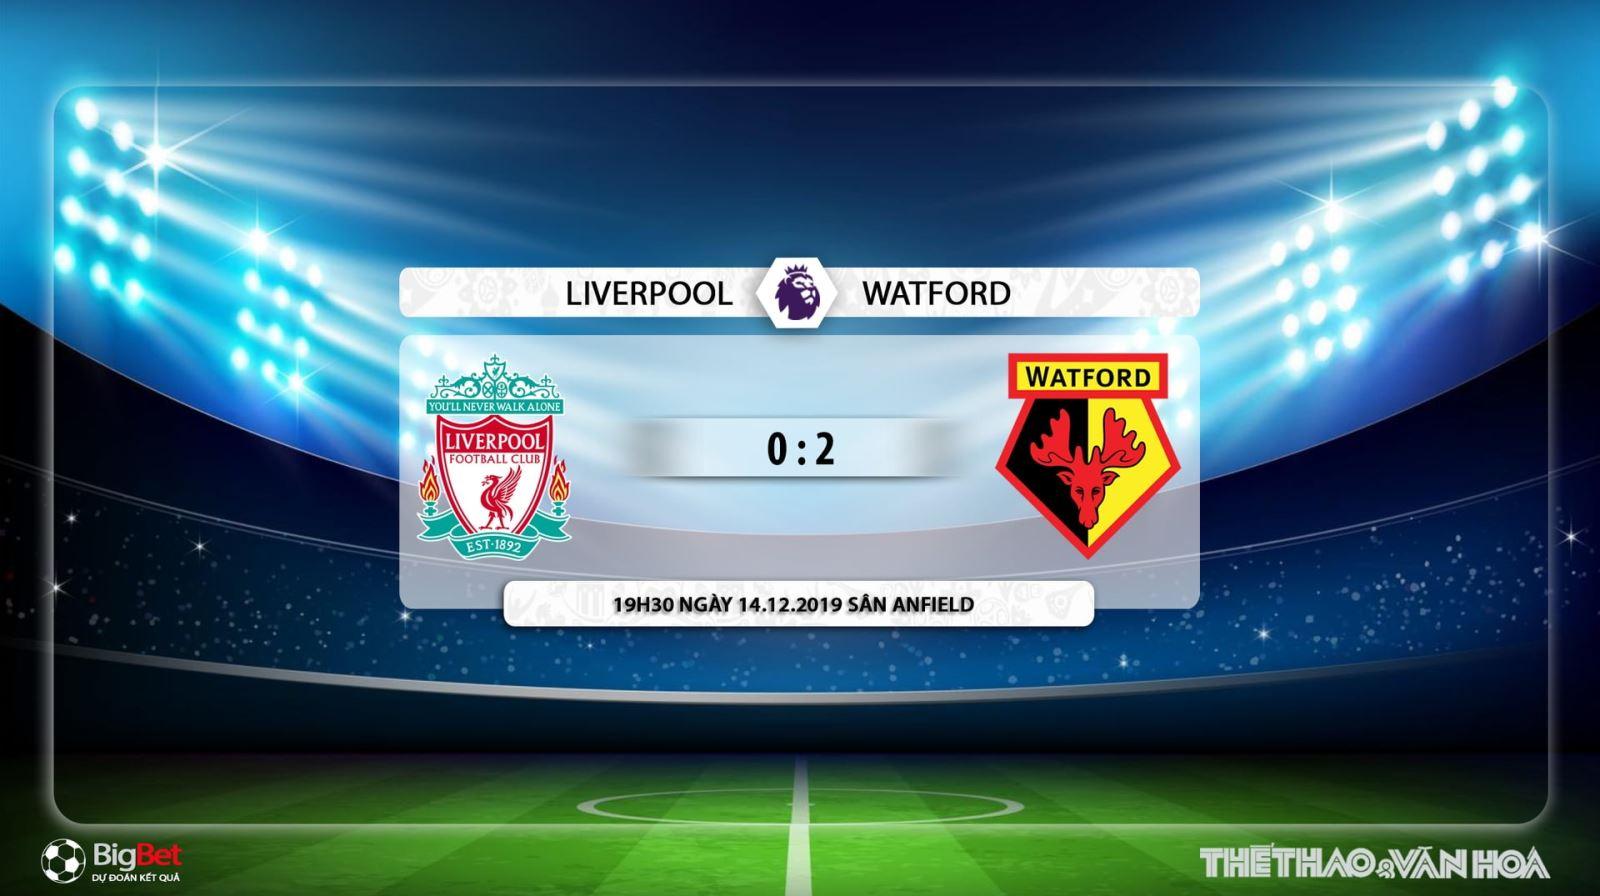 Liverpool vs Watford, Liverpool, Watford, trực tiếp bóng đá, trực tiếp Liverpool vs Watford, soi kèo  Liverpool vs Watford, dự đoán  Liverpool vs Watford